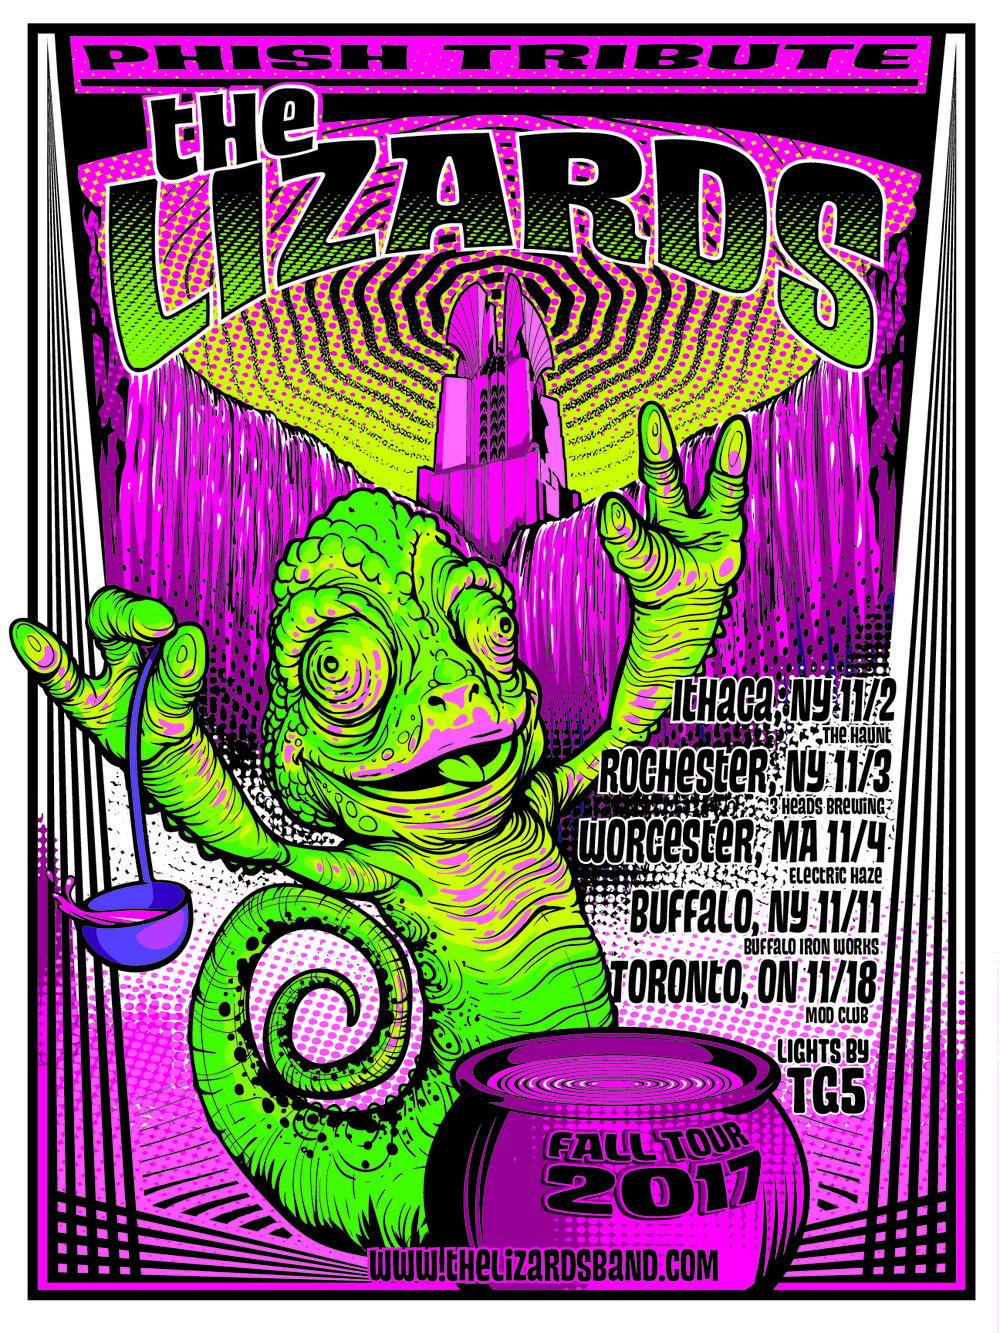 Fall tour 2017_dates.jpg